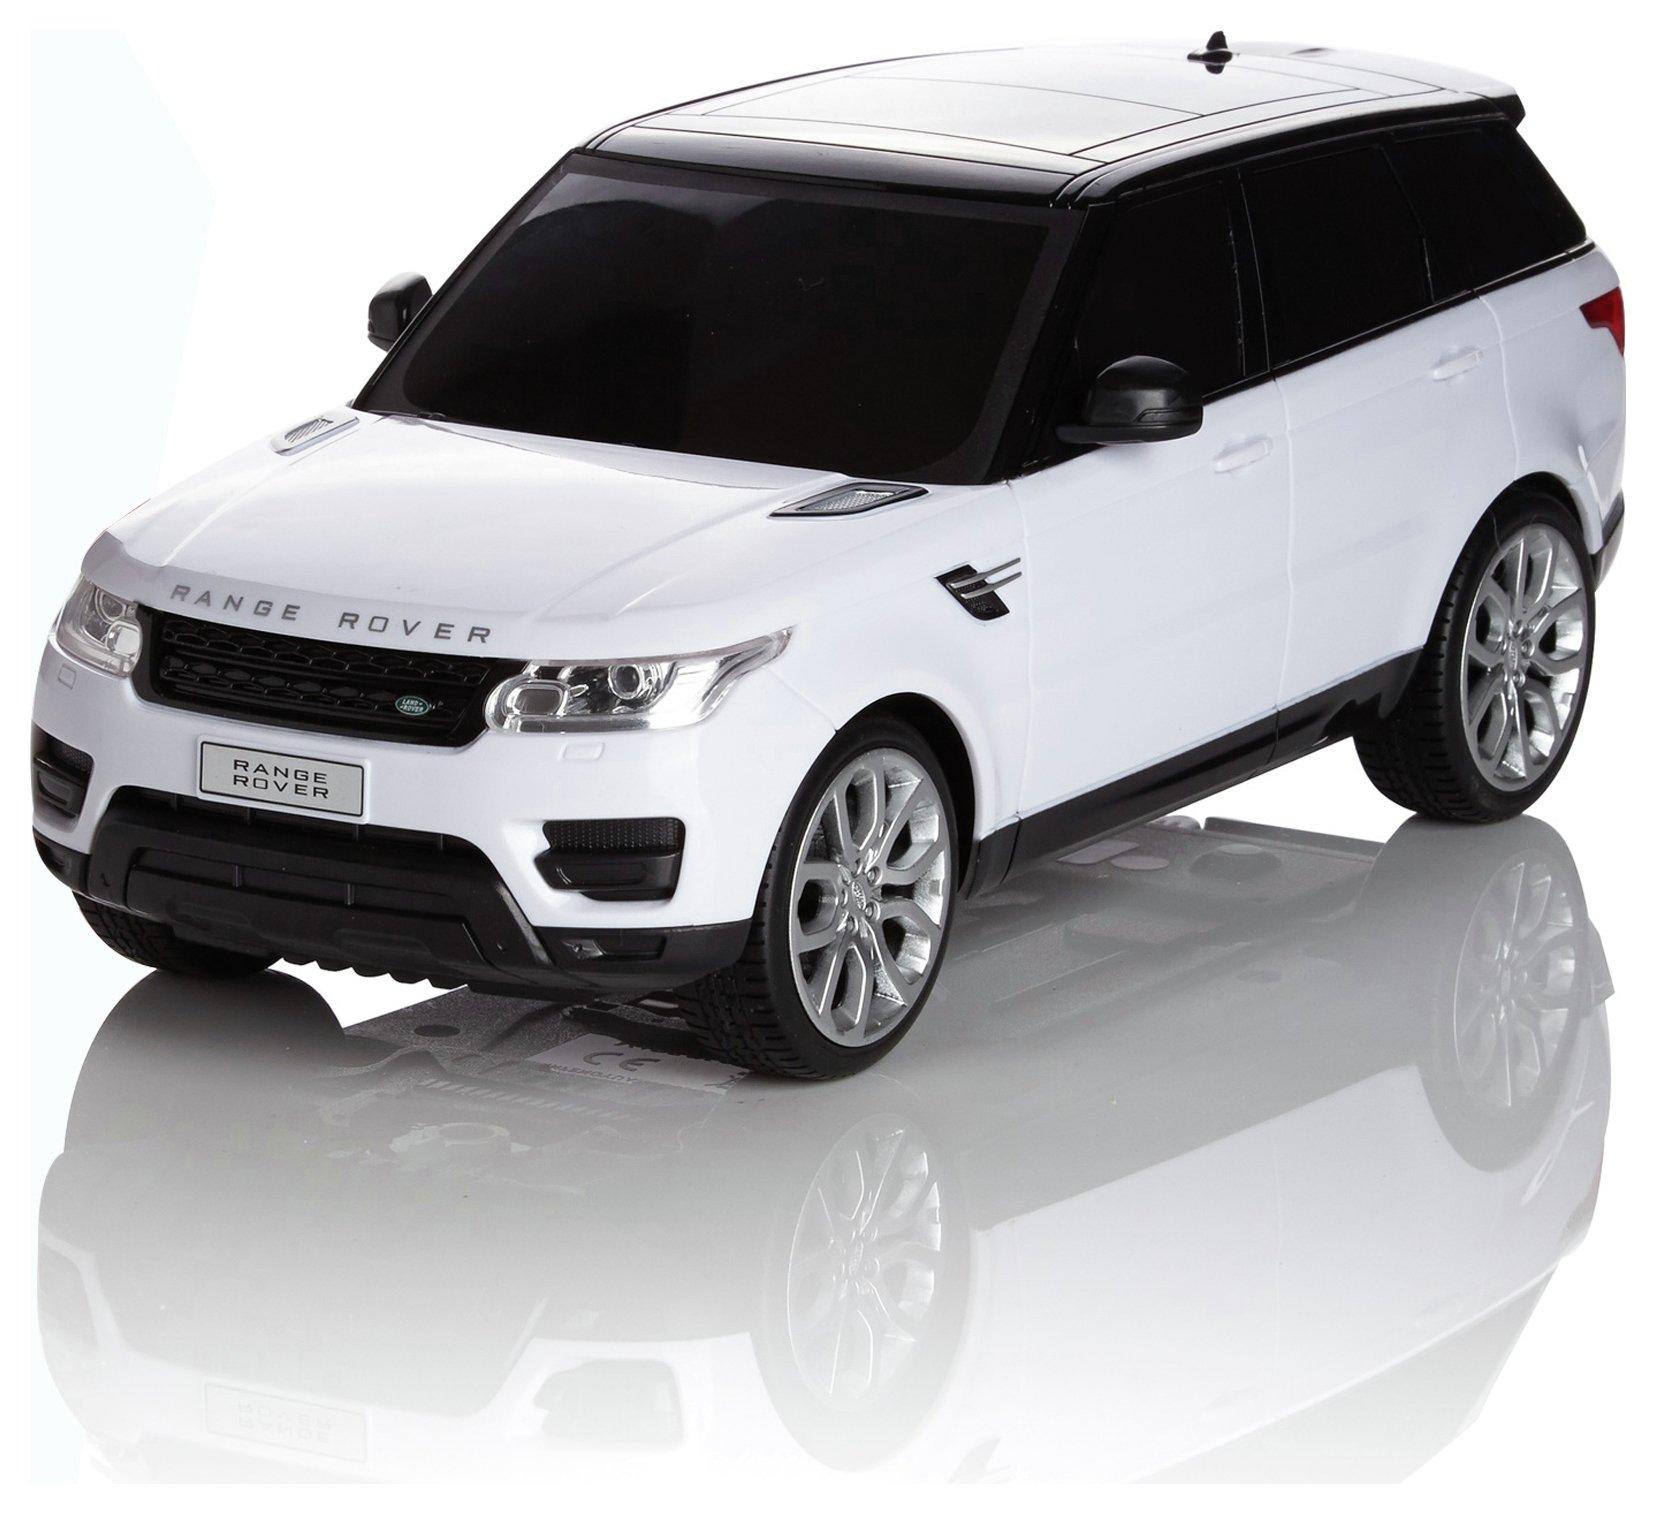 range rover sport 1 10 remote control car review. Black Bedroom Furniture Sets. Home Design Ideas